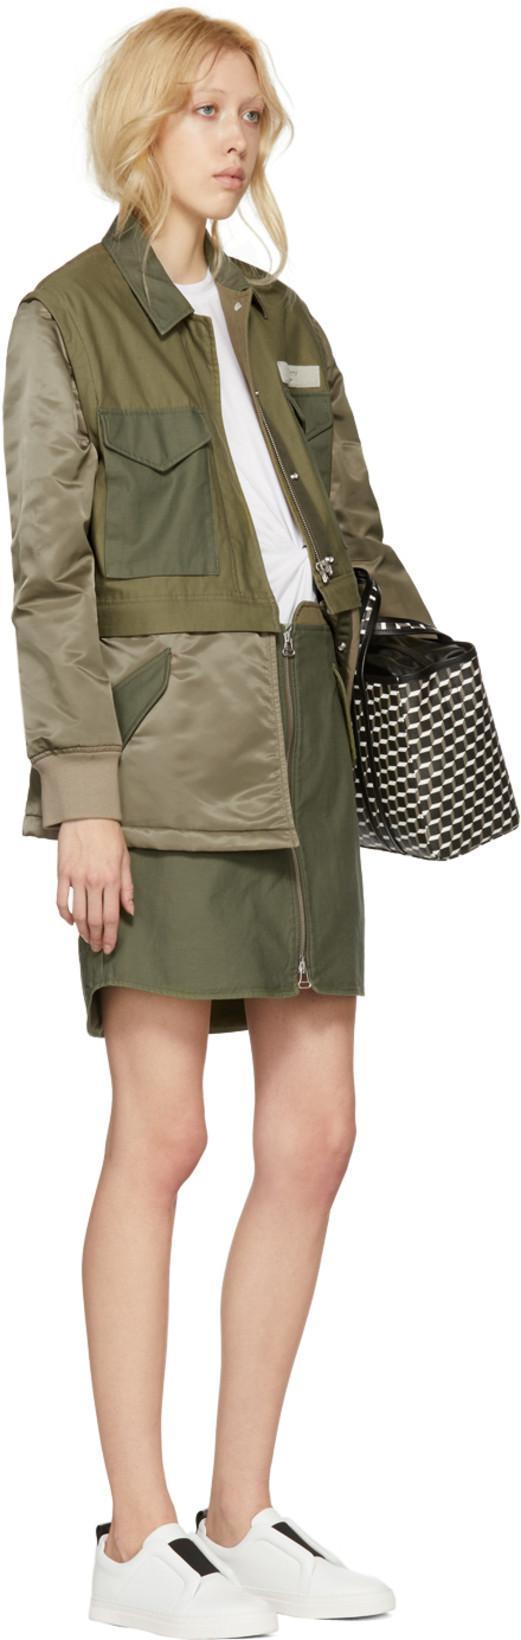 32333cd51 Rag & Bone Rag And Bone Green Maverick Skirt In Army Green | ModeSens